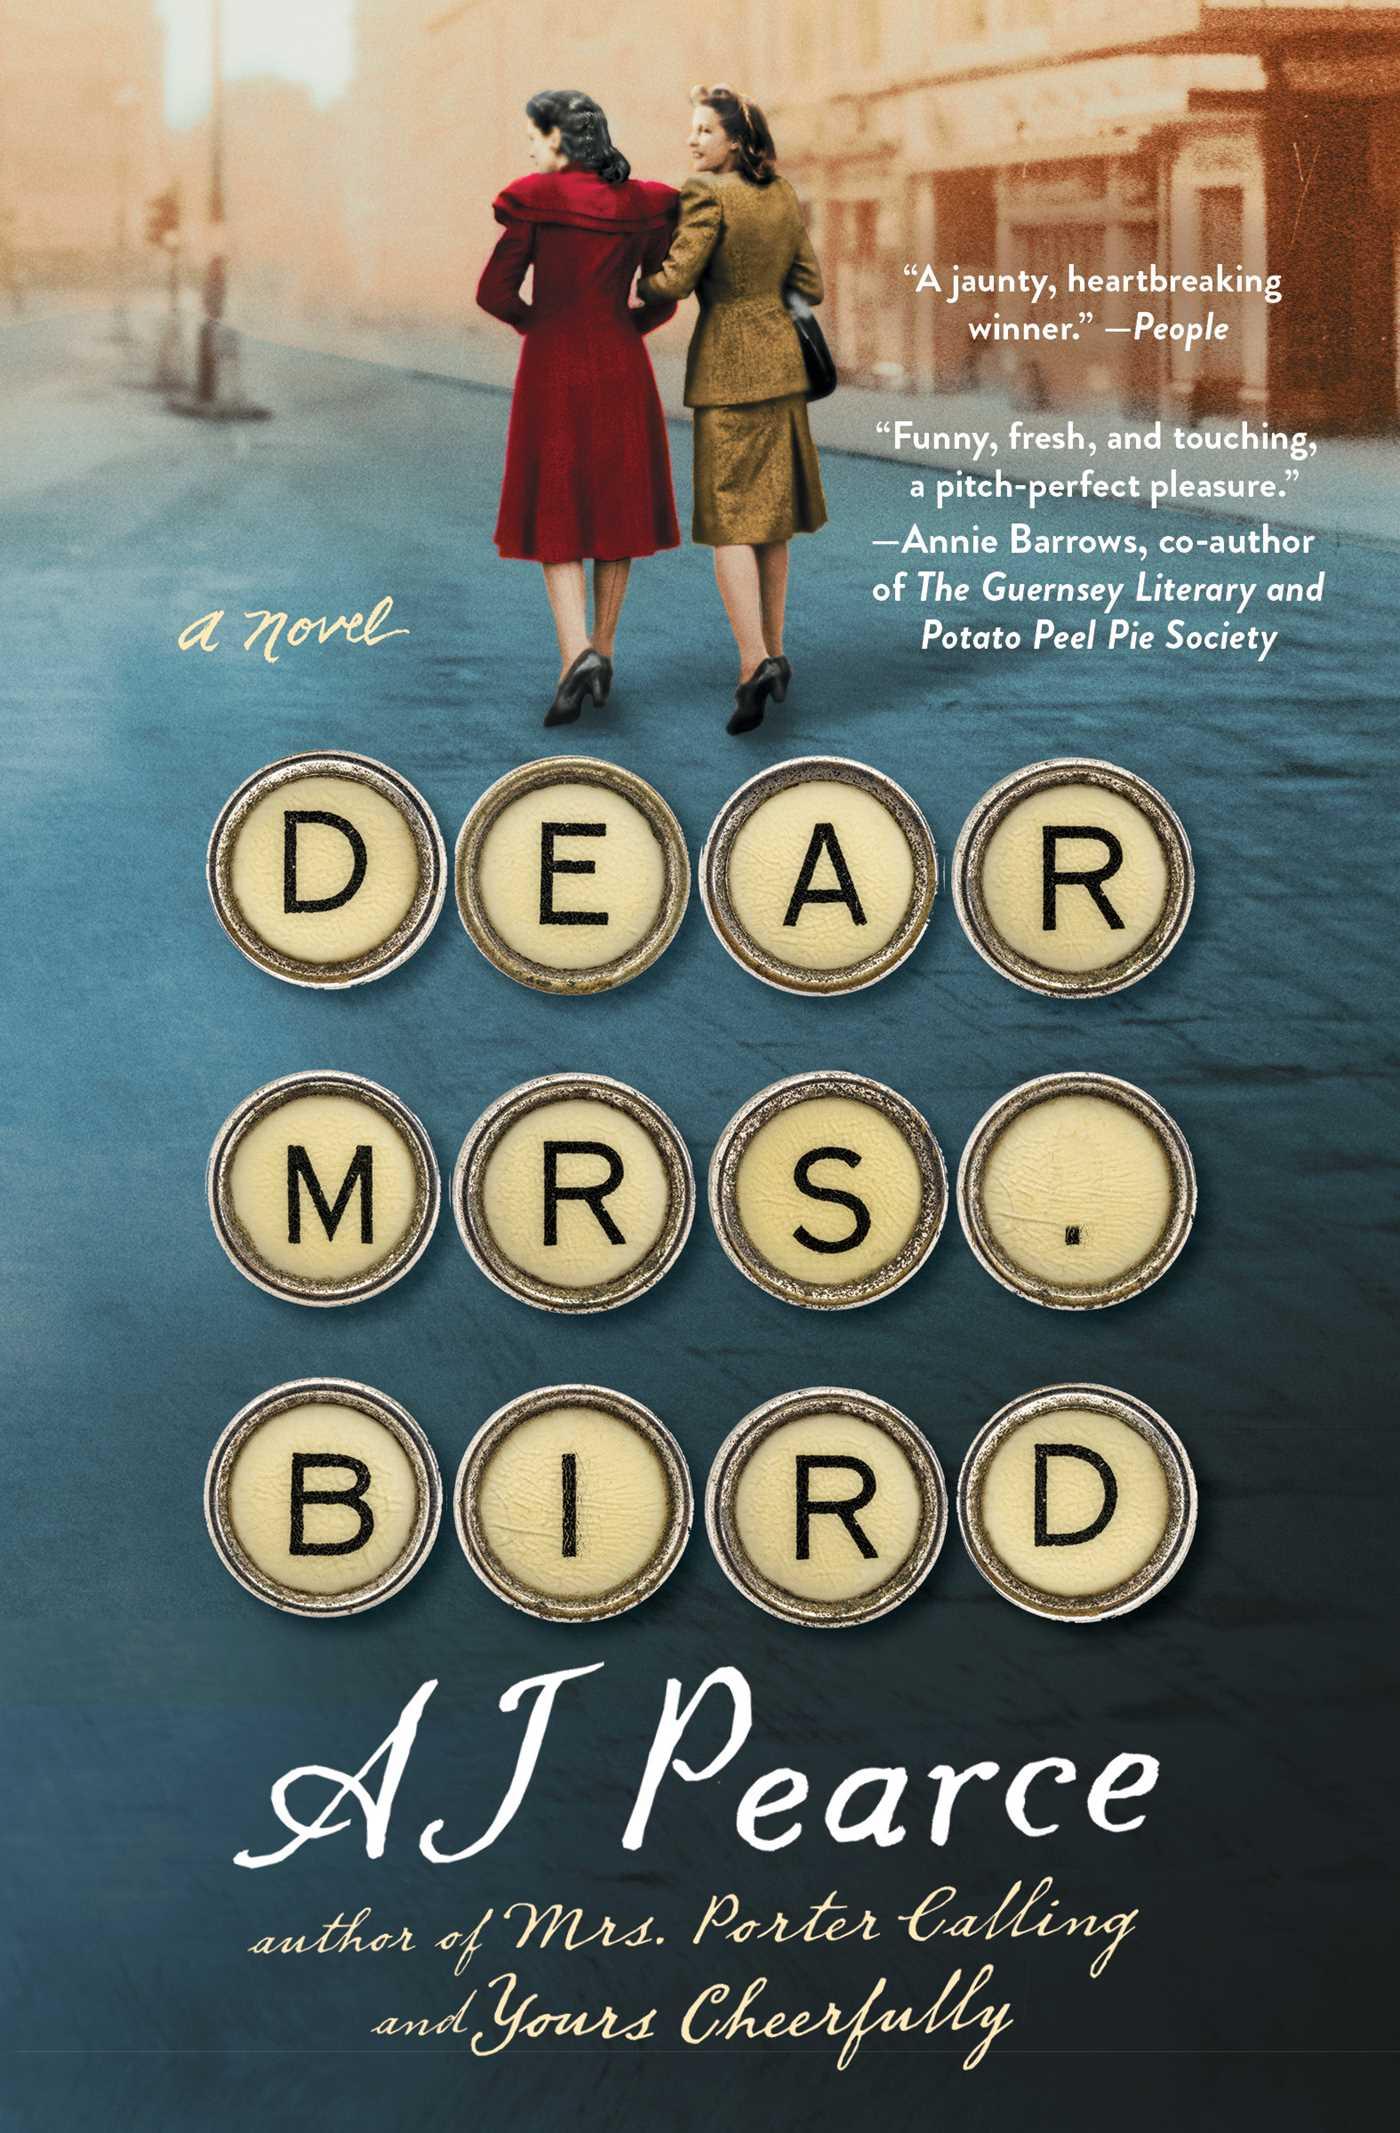 Dear Mrs. Bird A Novel